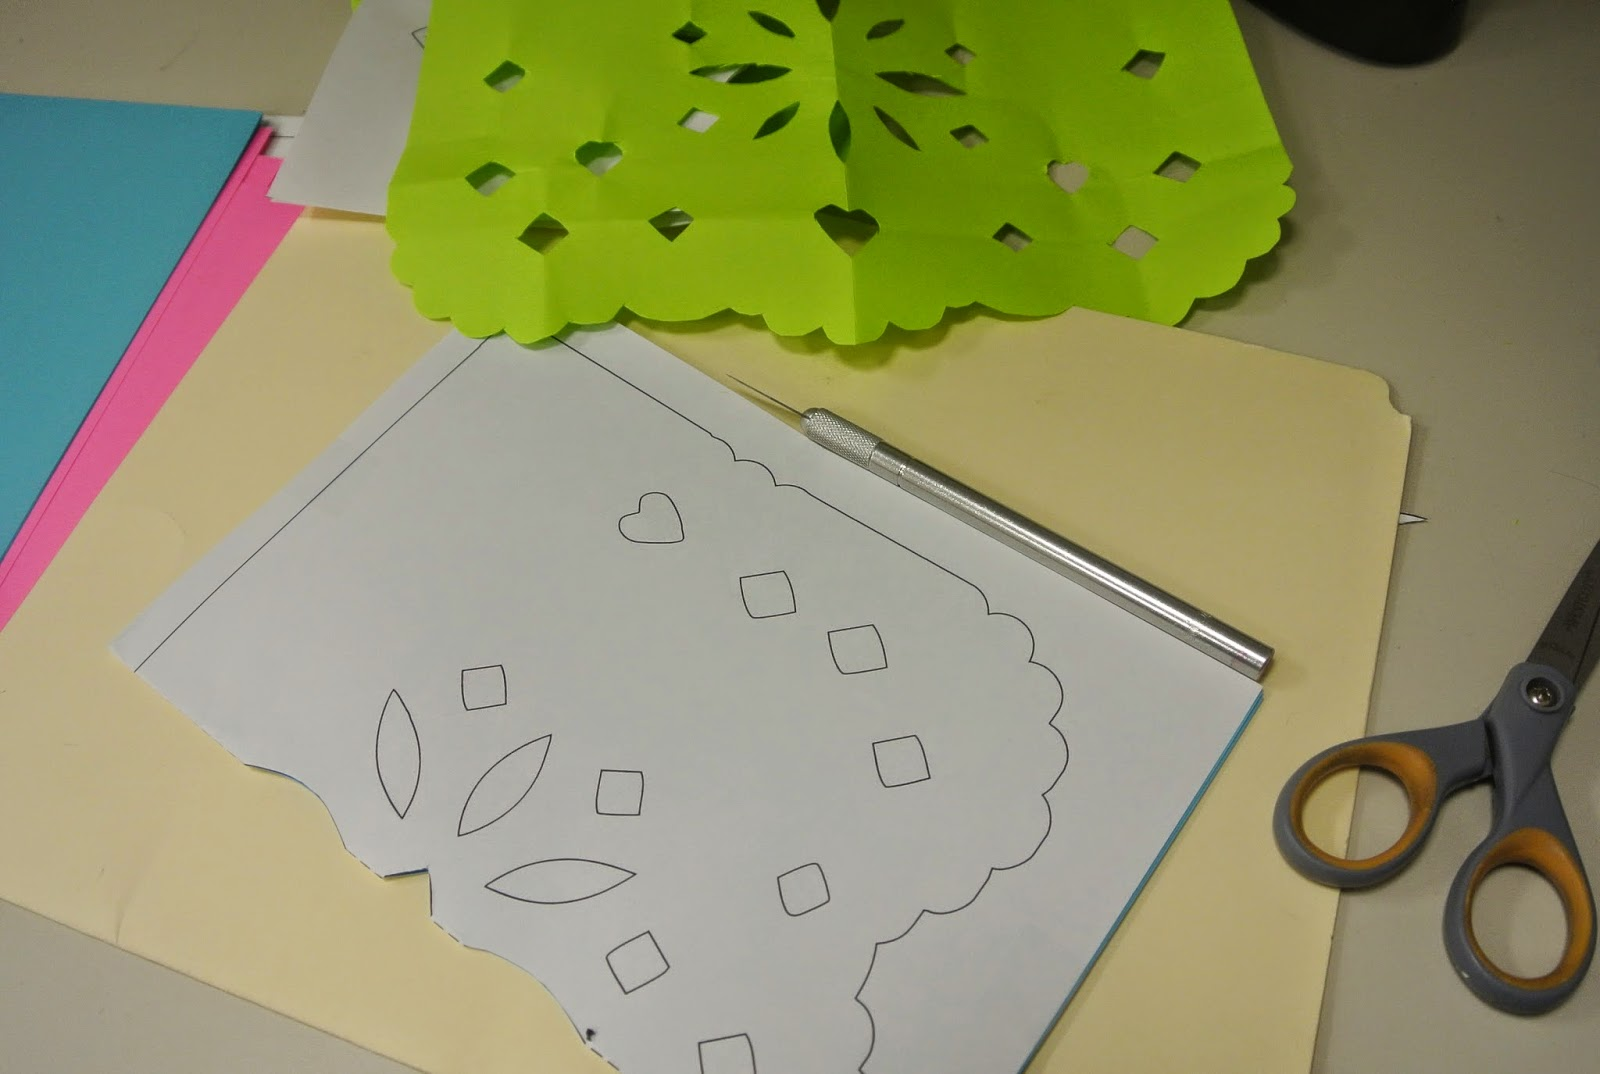 papel picado designs template - photo #47